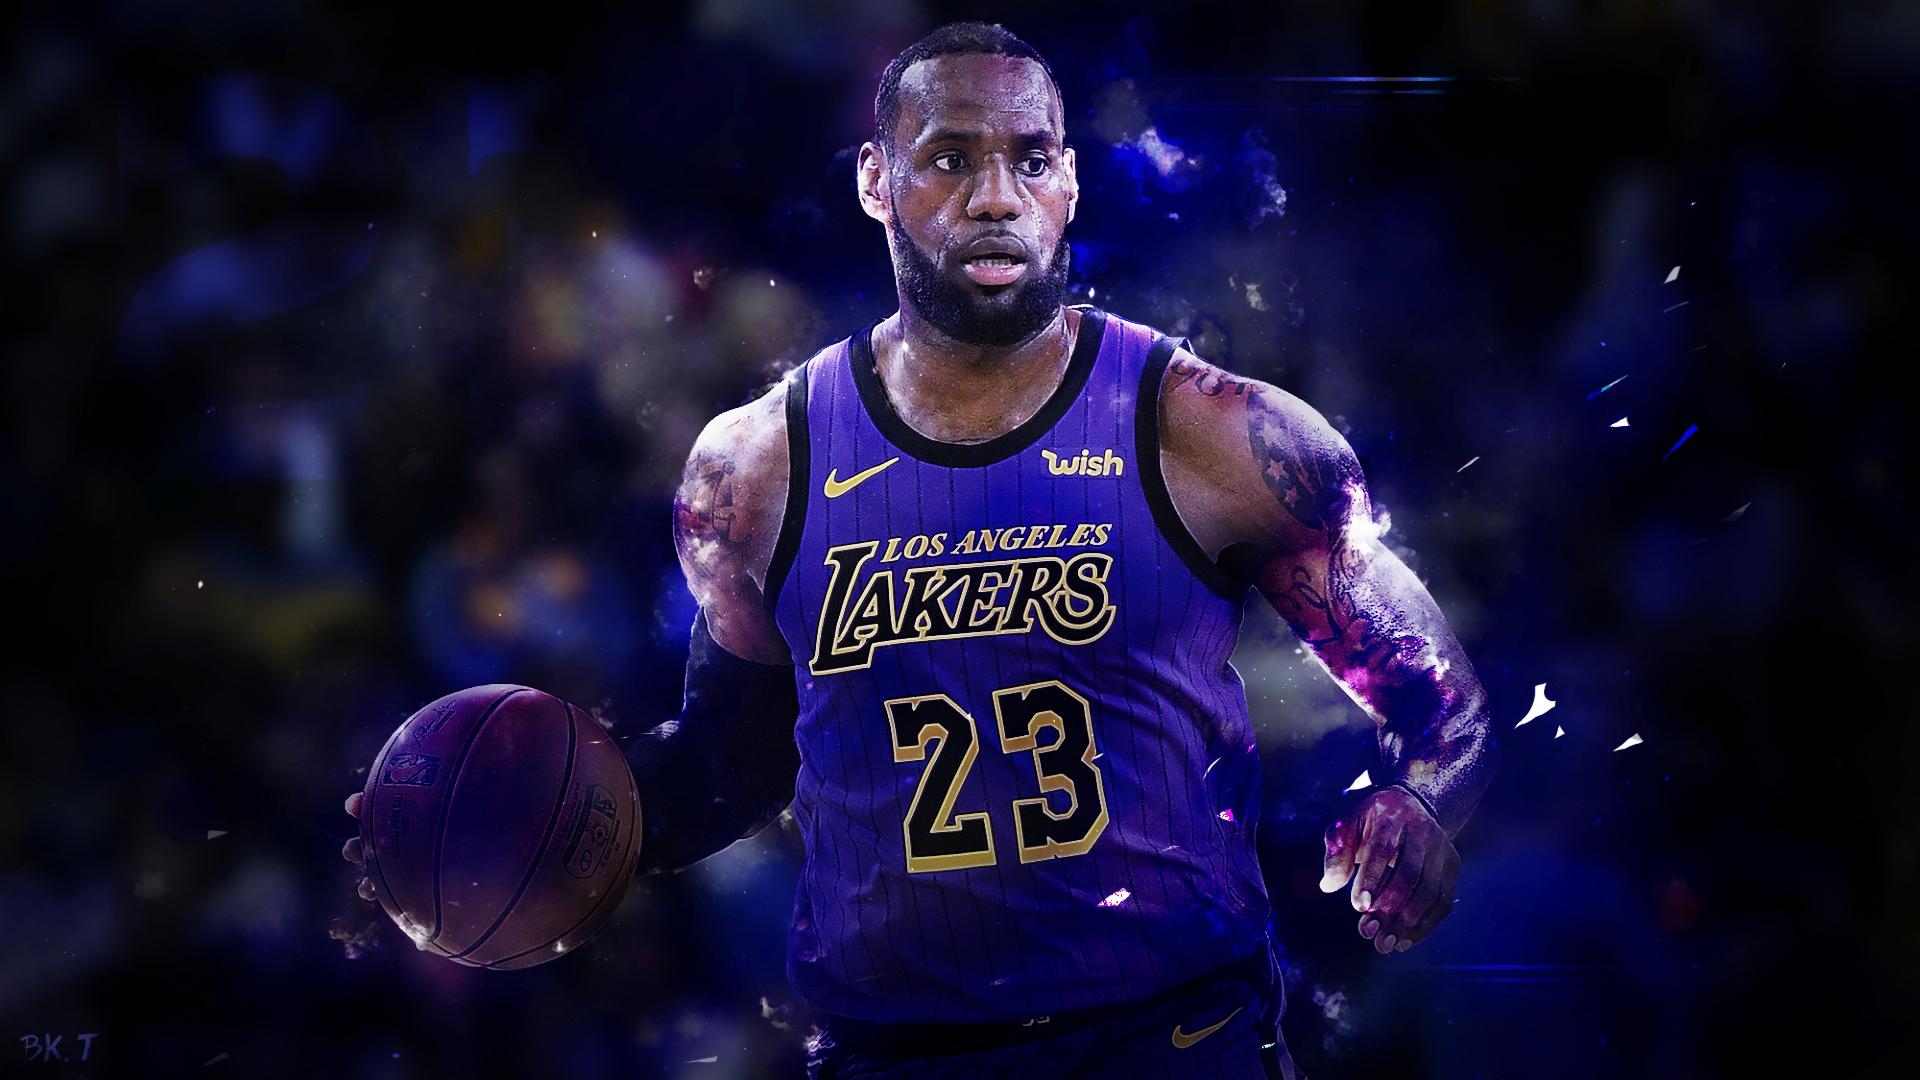 Lebron Lakers Wallpapers: LeBron James Lakers Wallpaper HD 2019 By BkTiem On DeviantArt